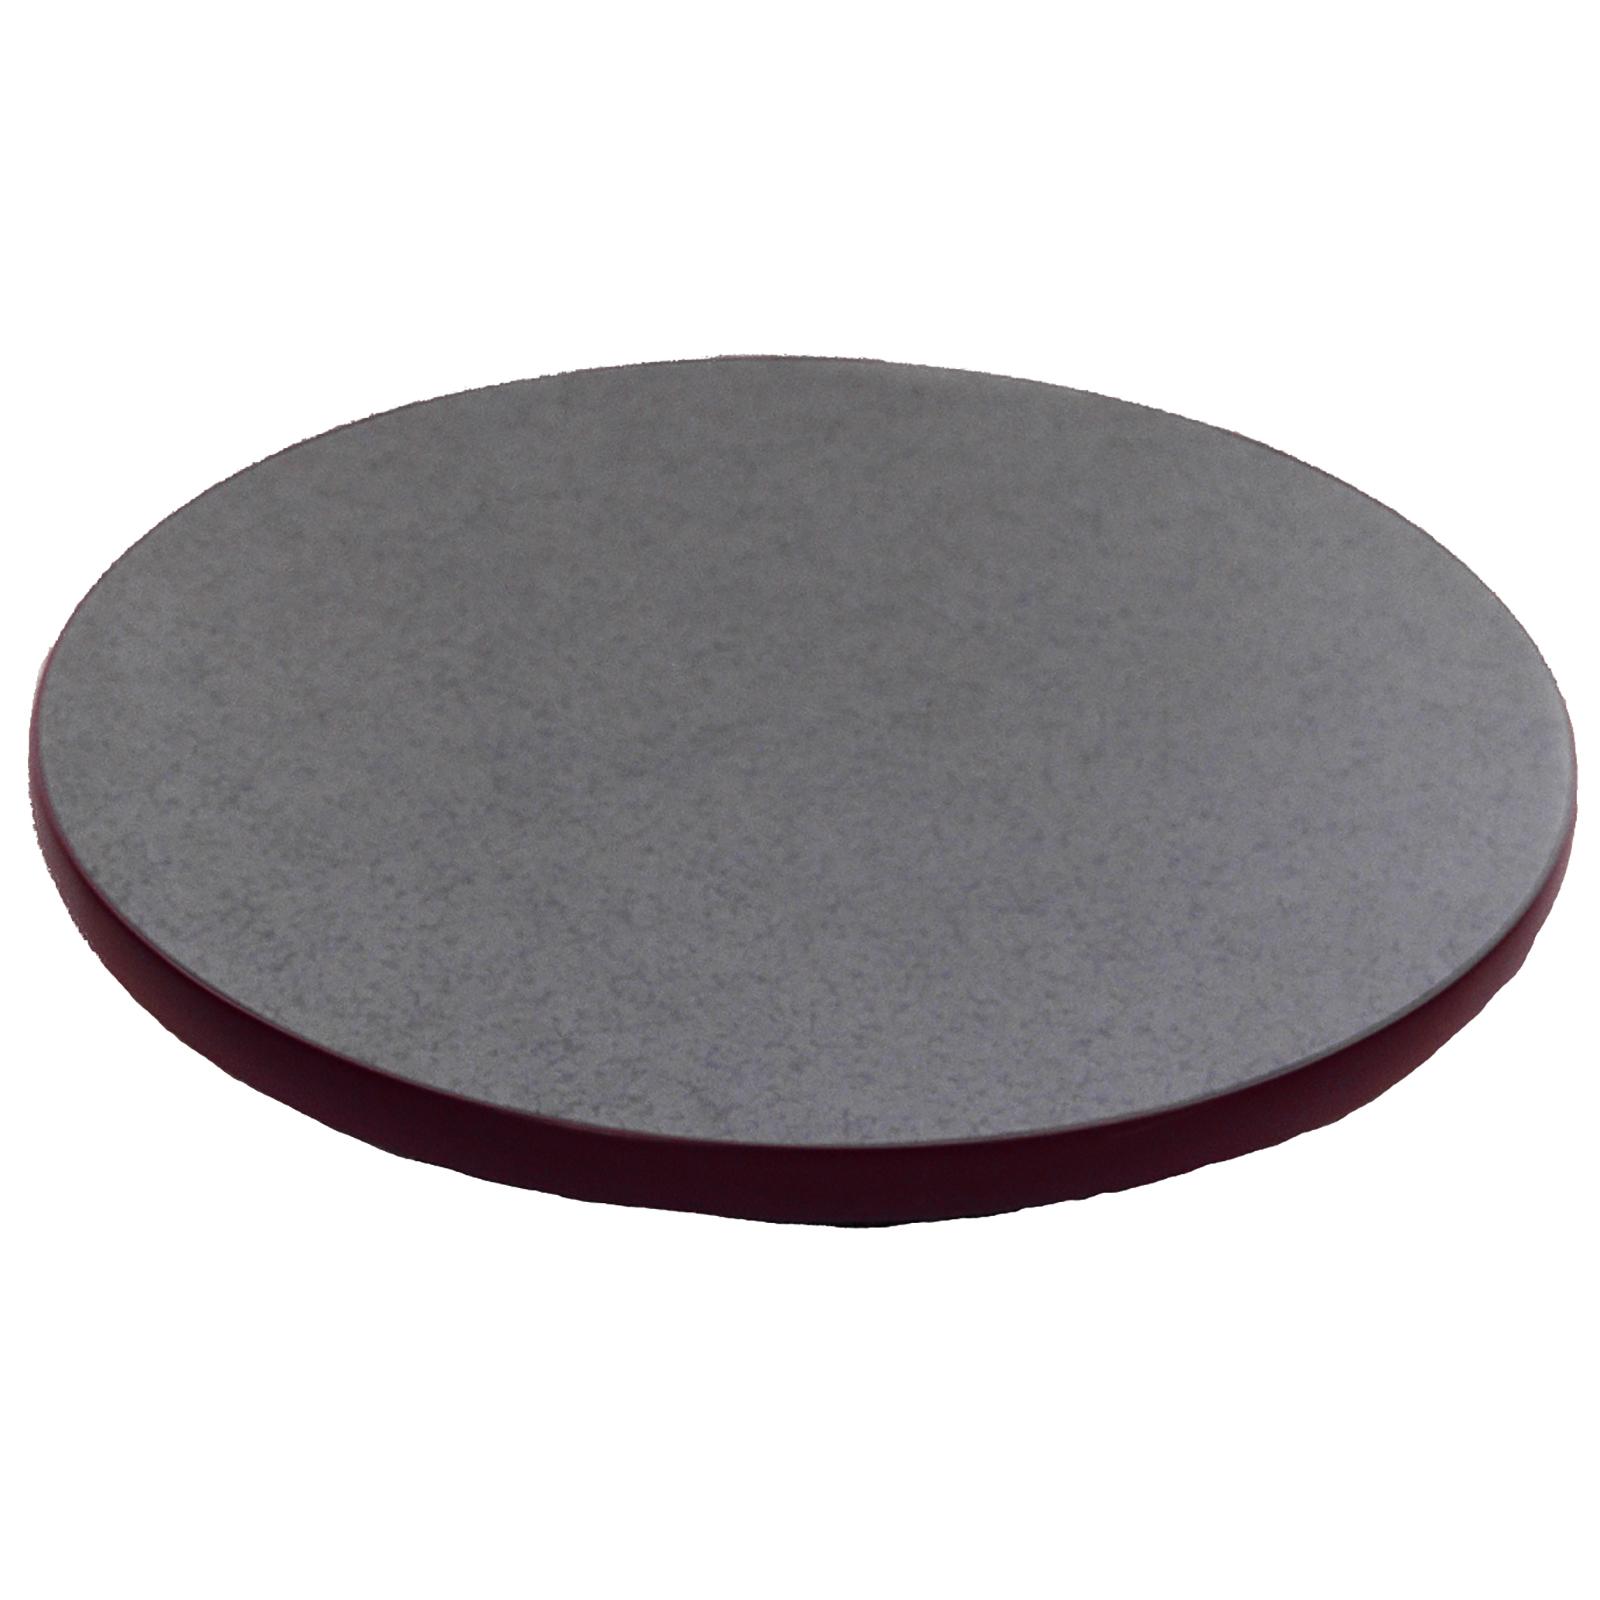 Oak Street CTM30R-1 table top, laminate